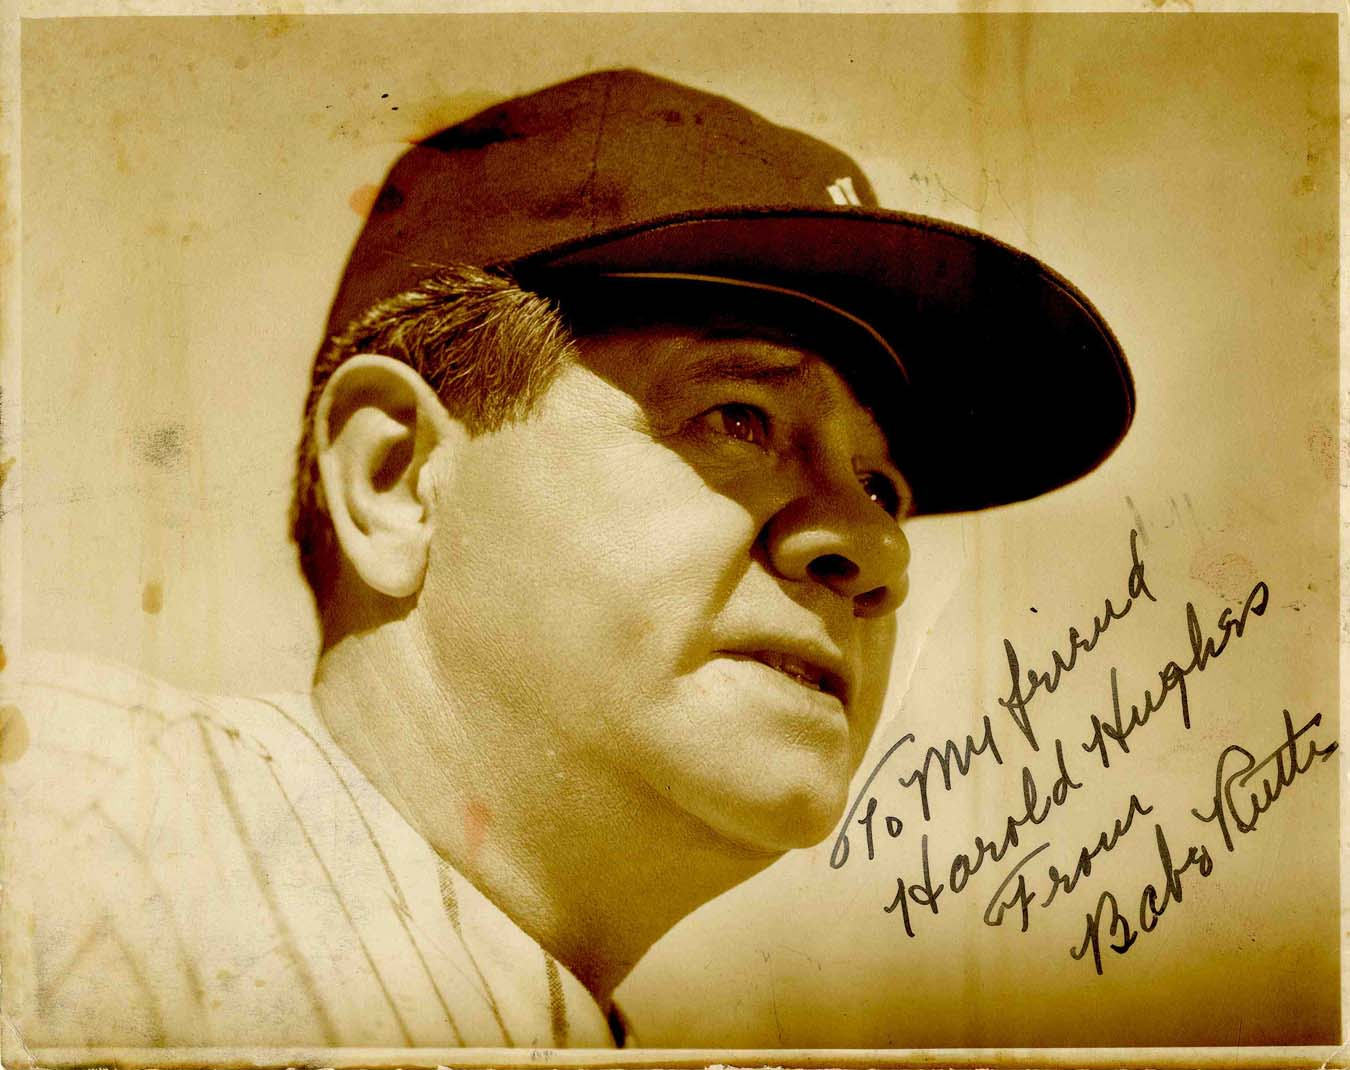 Babe Ruth Autograph